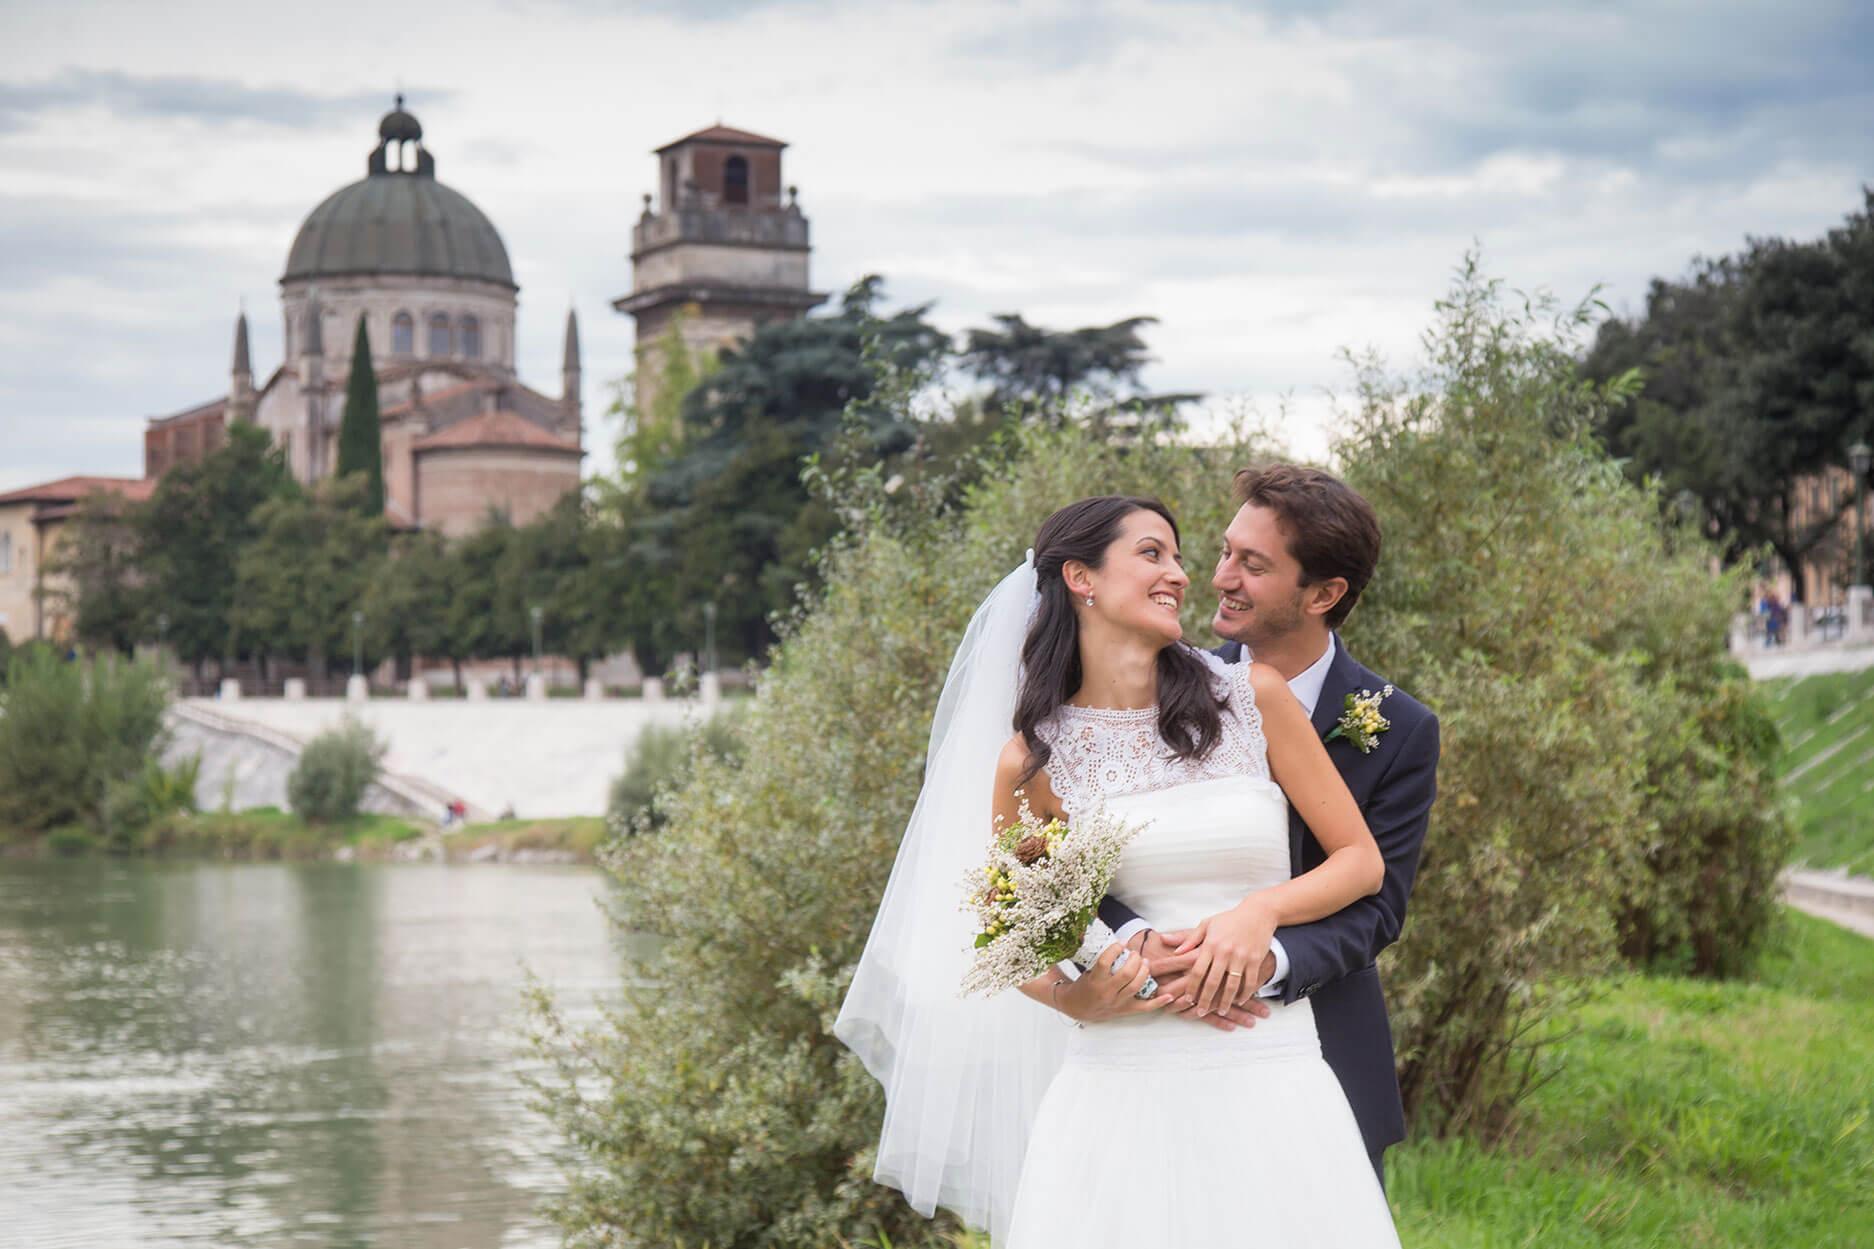 Francesca-Ferrati-WeddingIMG_0948